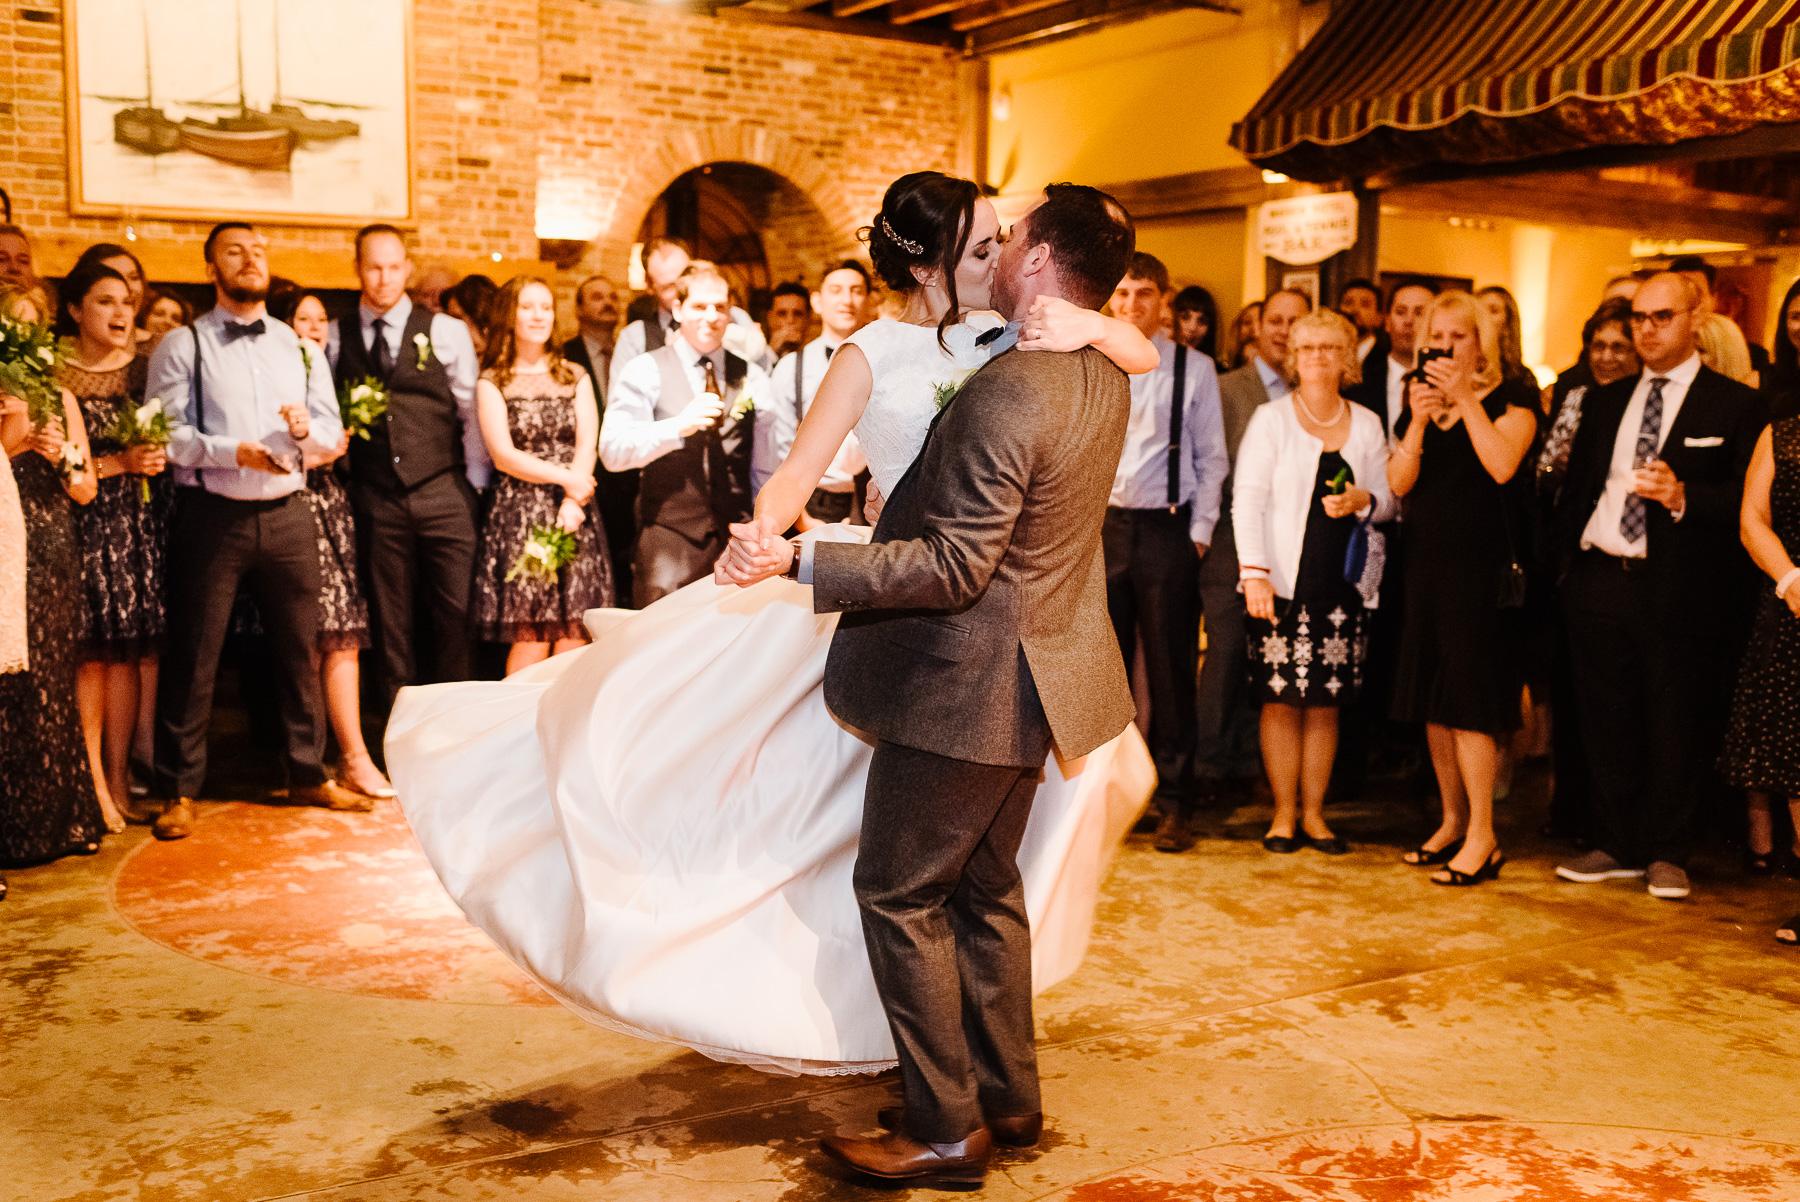 108-Laurita Winery Wedding New Jersey Wedding Photographer Laurita Winery Weddings Longbrook Photography.jpg